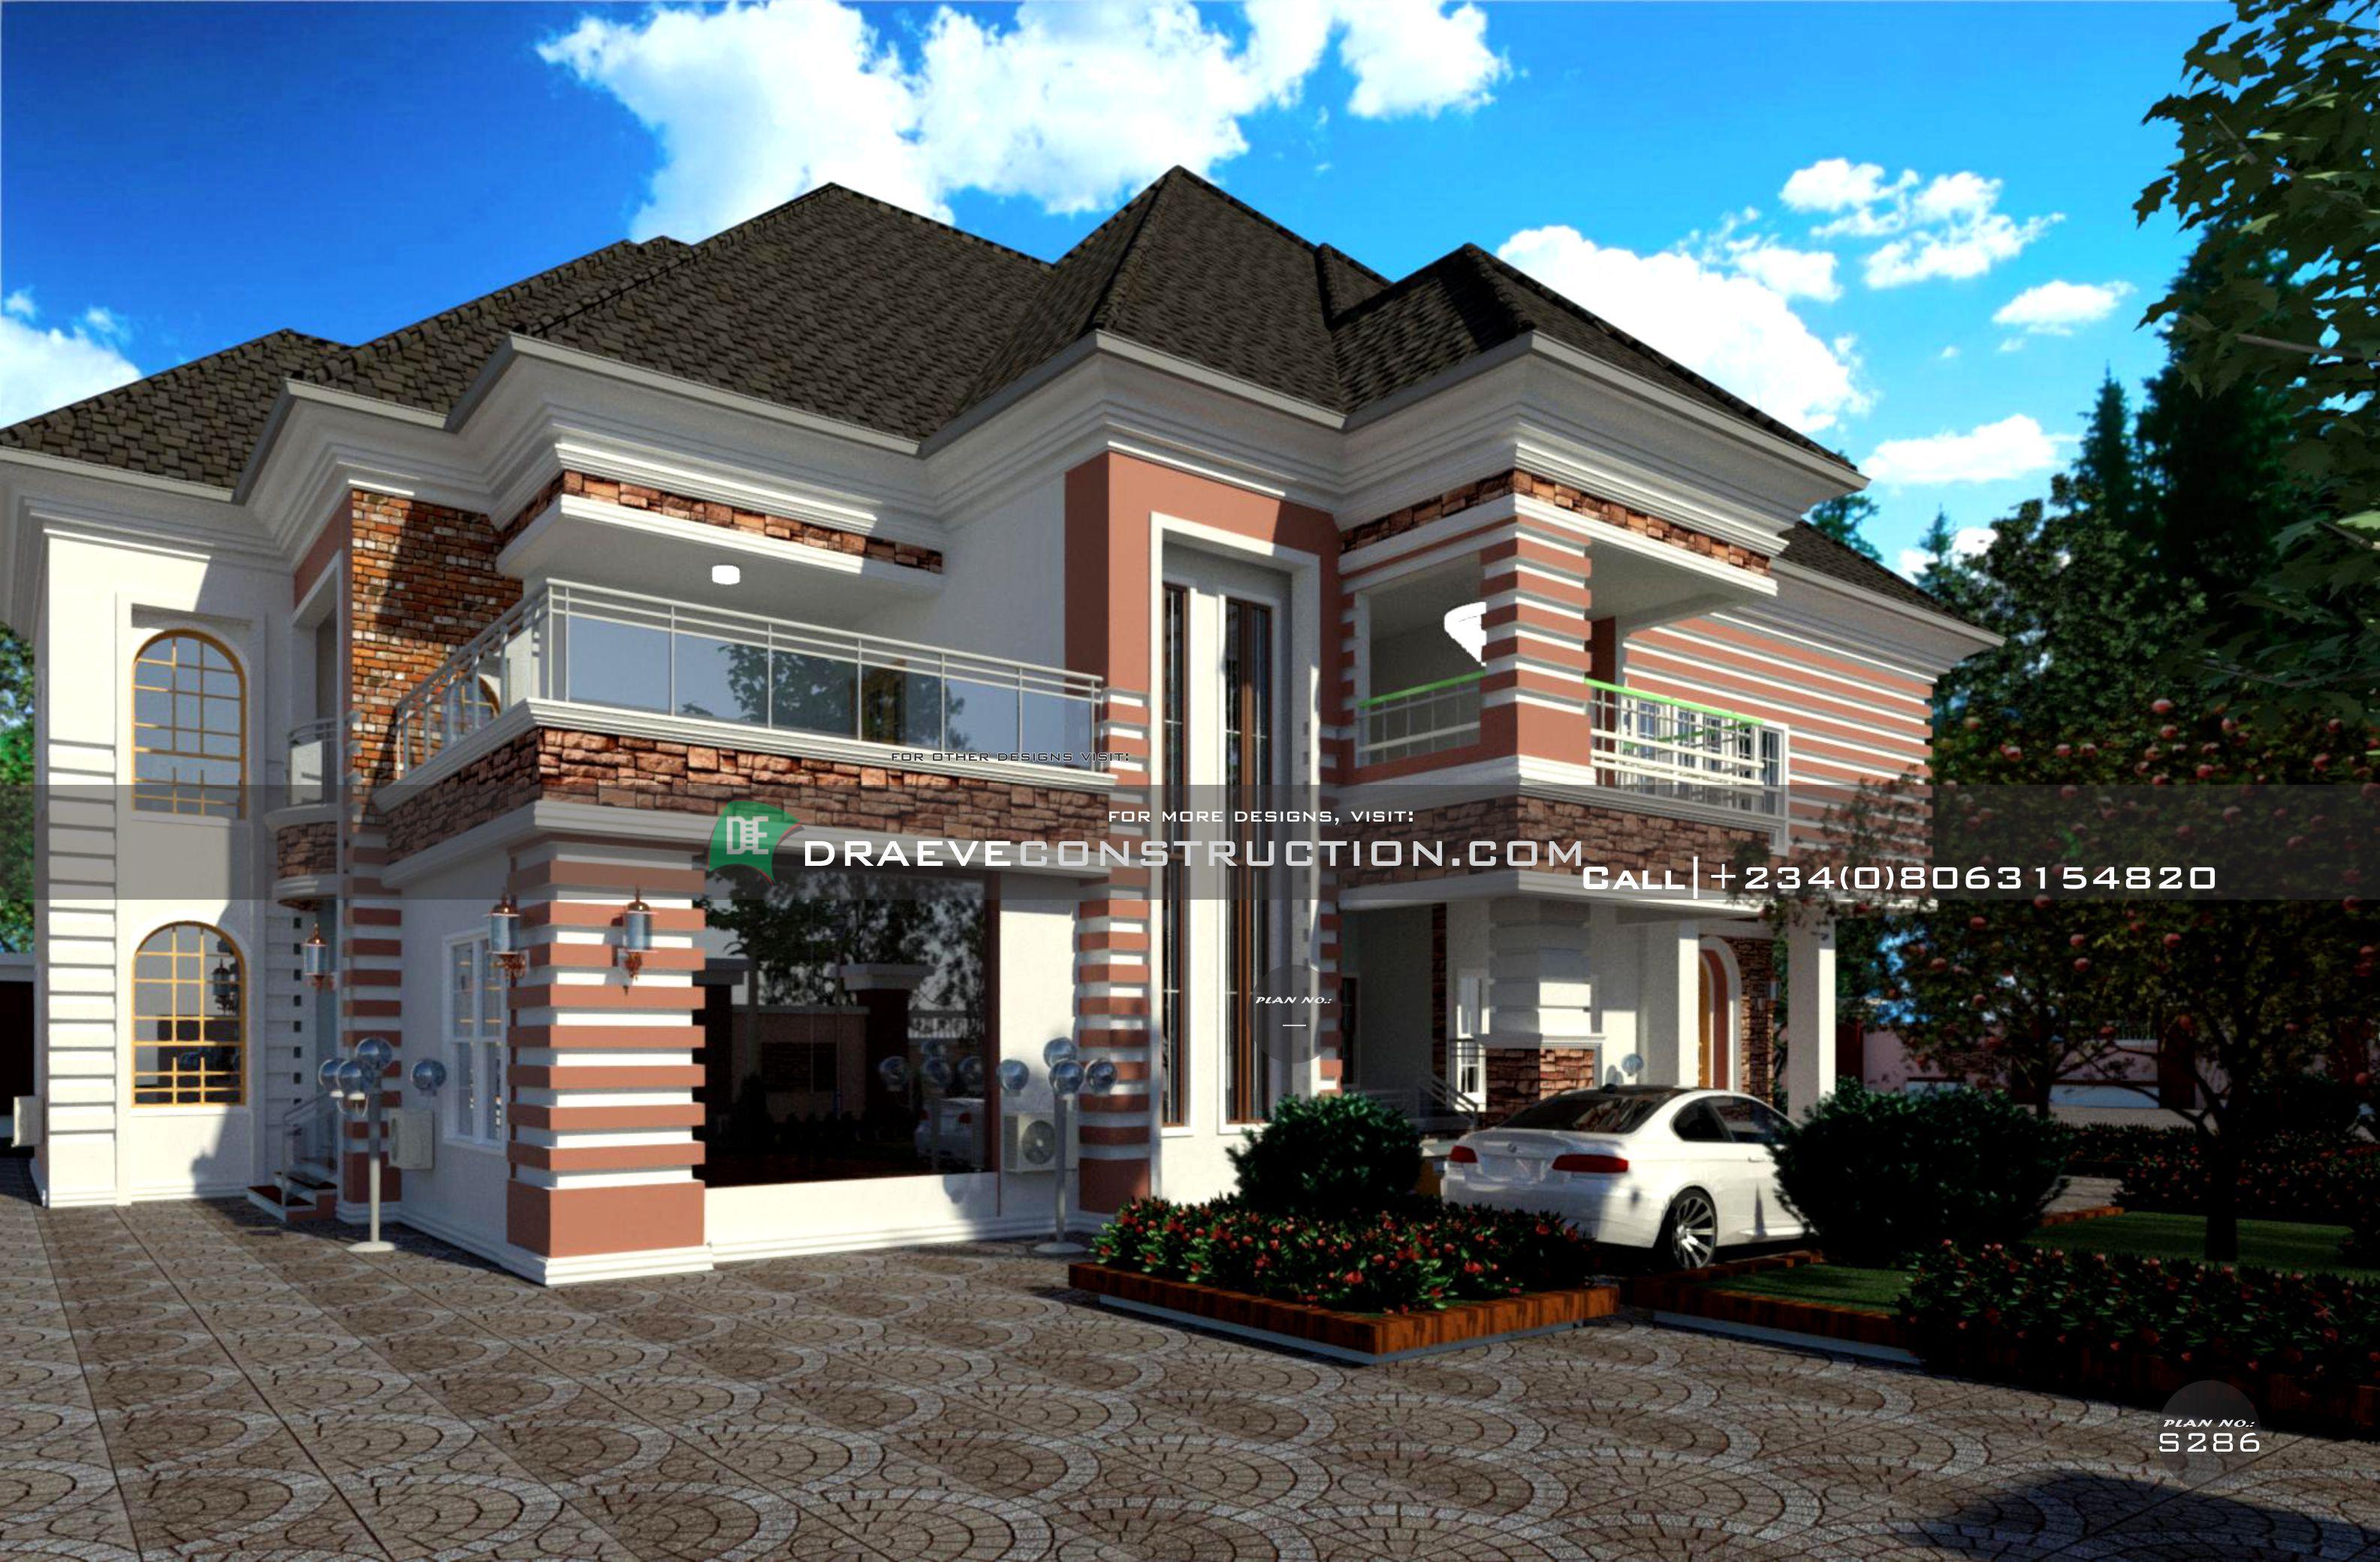 6 Bedroom Luxury Duplex With Sunbath Sitout In 2020 Building House Plans Designs Home Design Plans Building Design